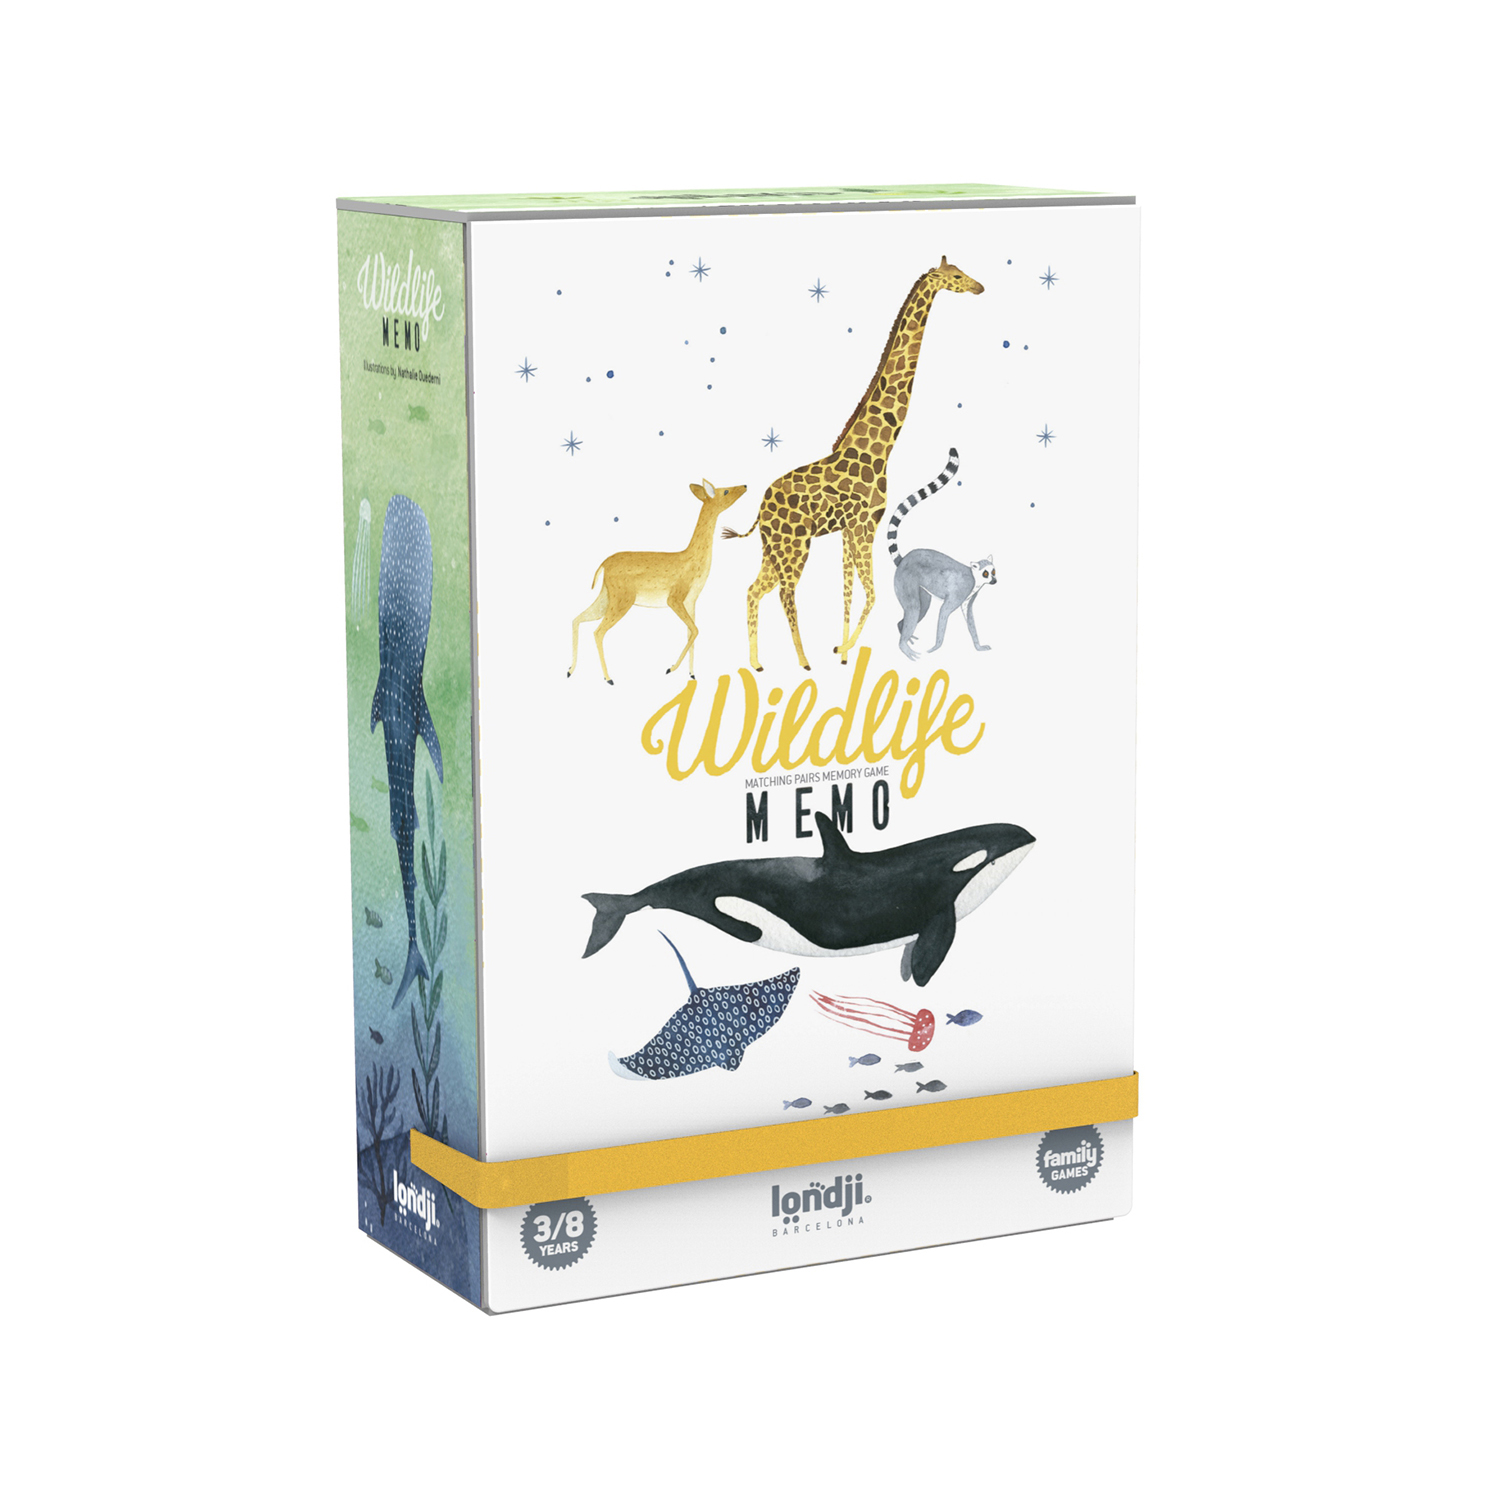 Londji – Wildlife Memo Matching Pairs Memory Game in Box